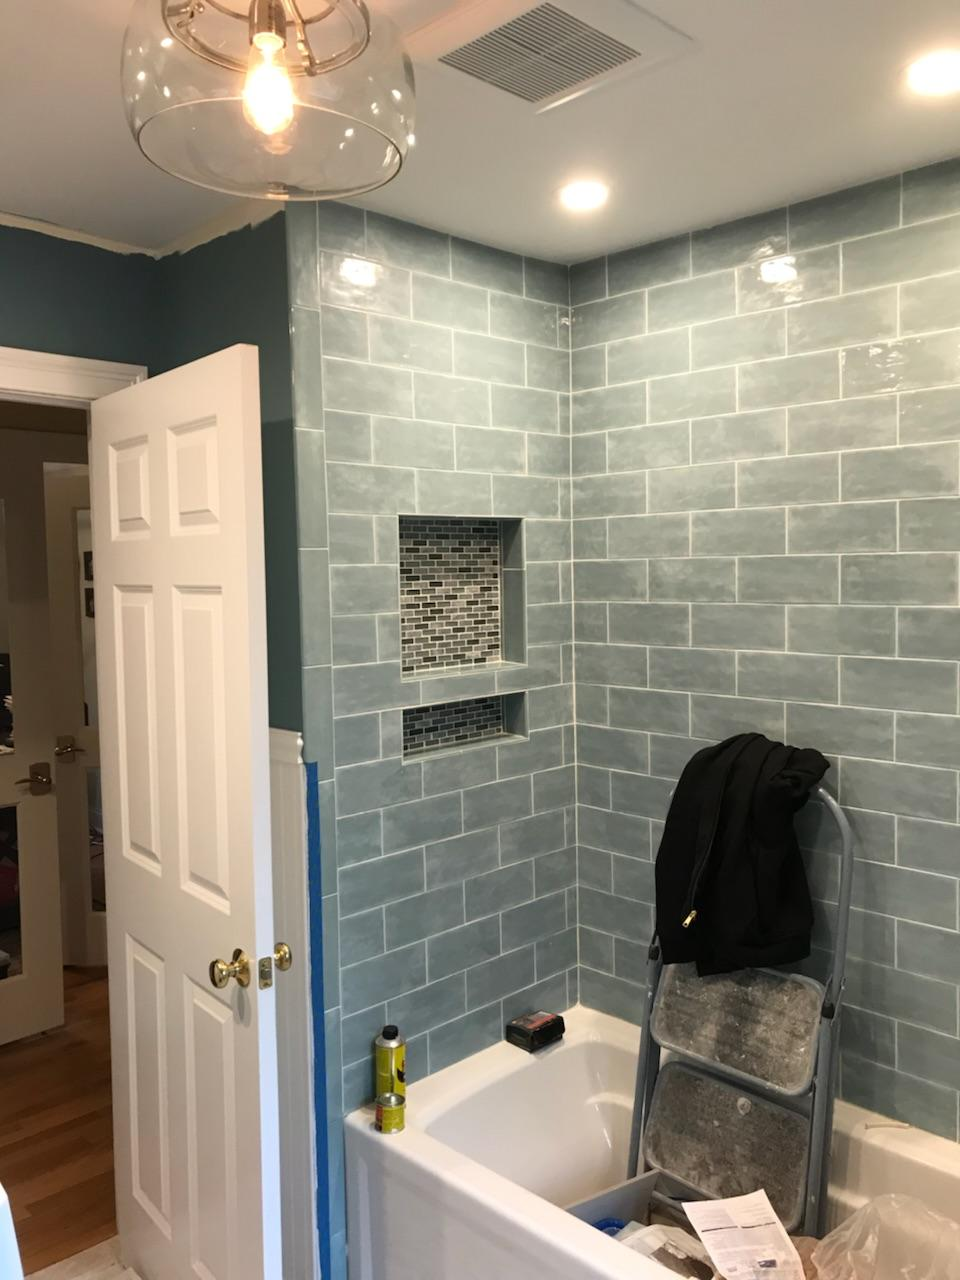 Shaw Remodeling - Progress photo - Bathroom Remodel in East Lyme CT (1).jpg